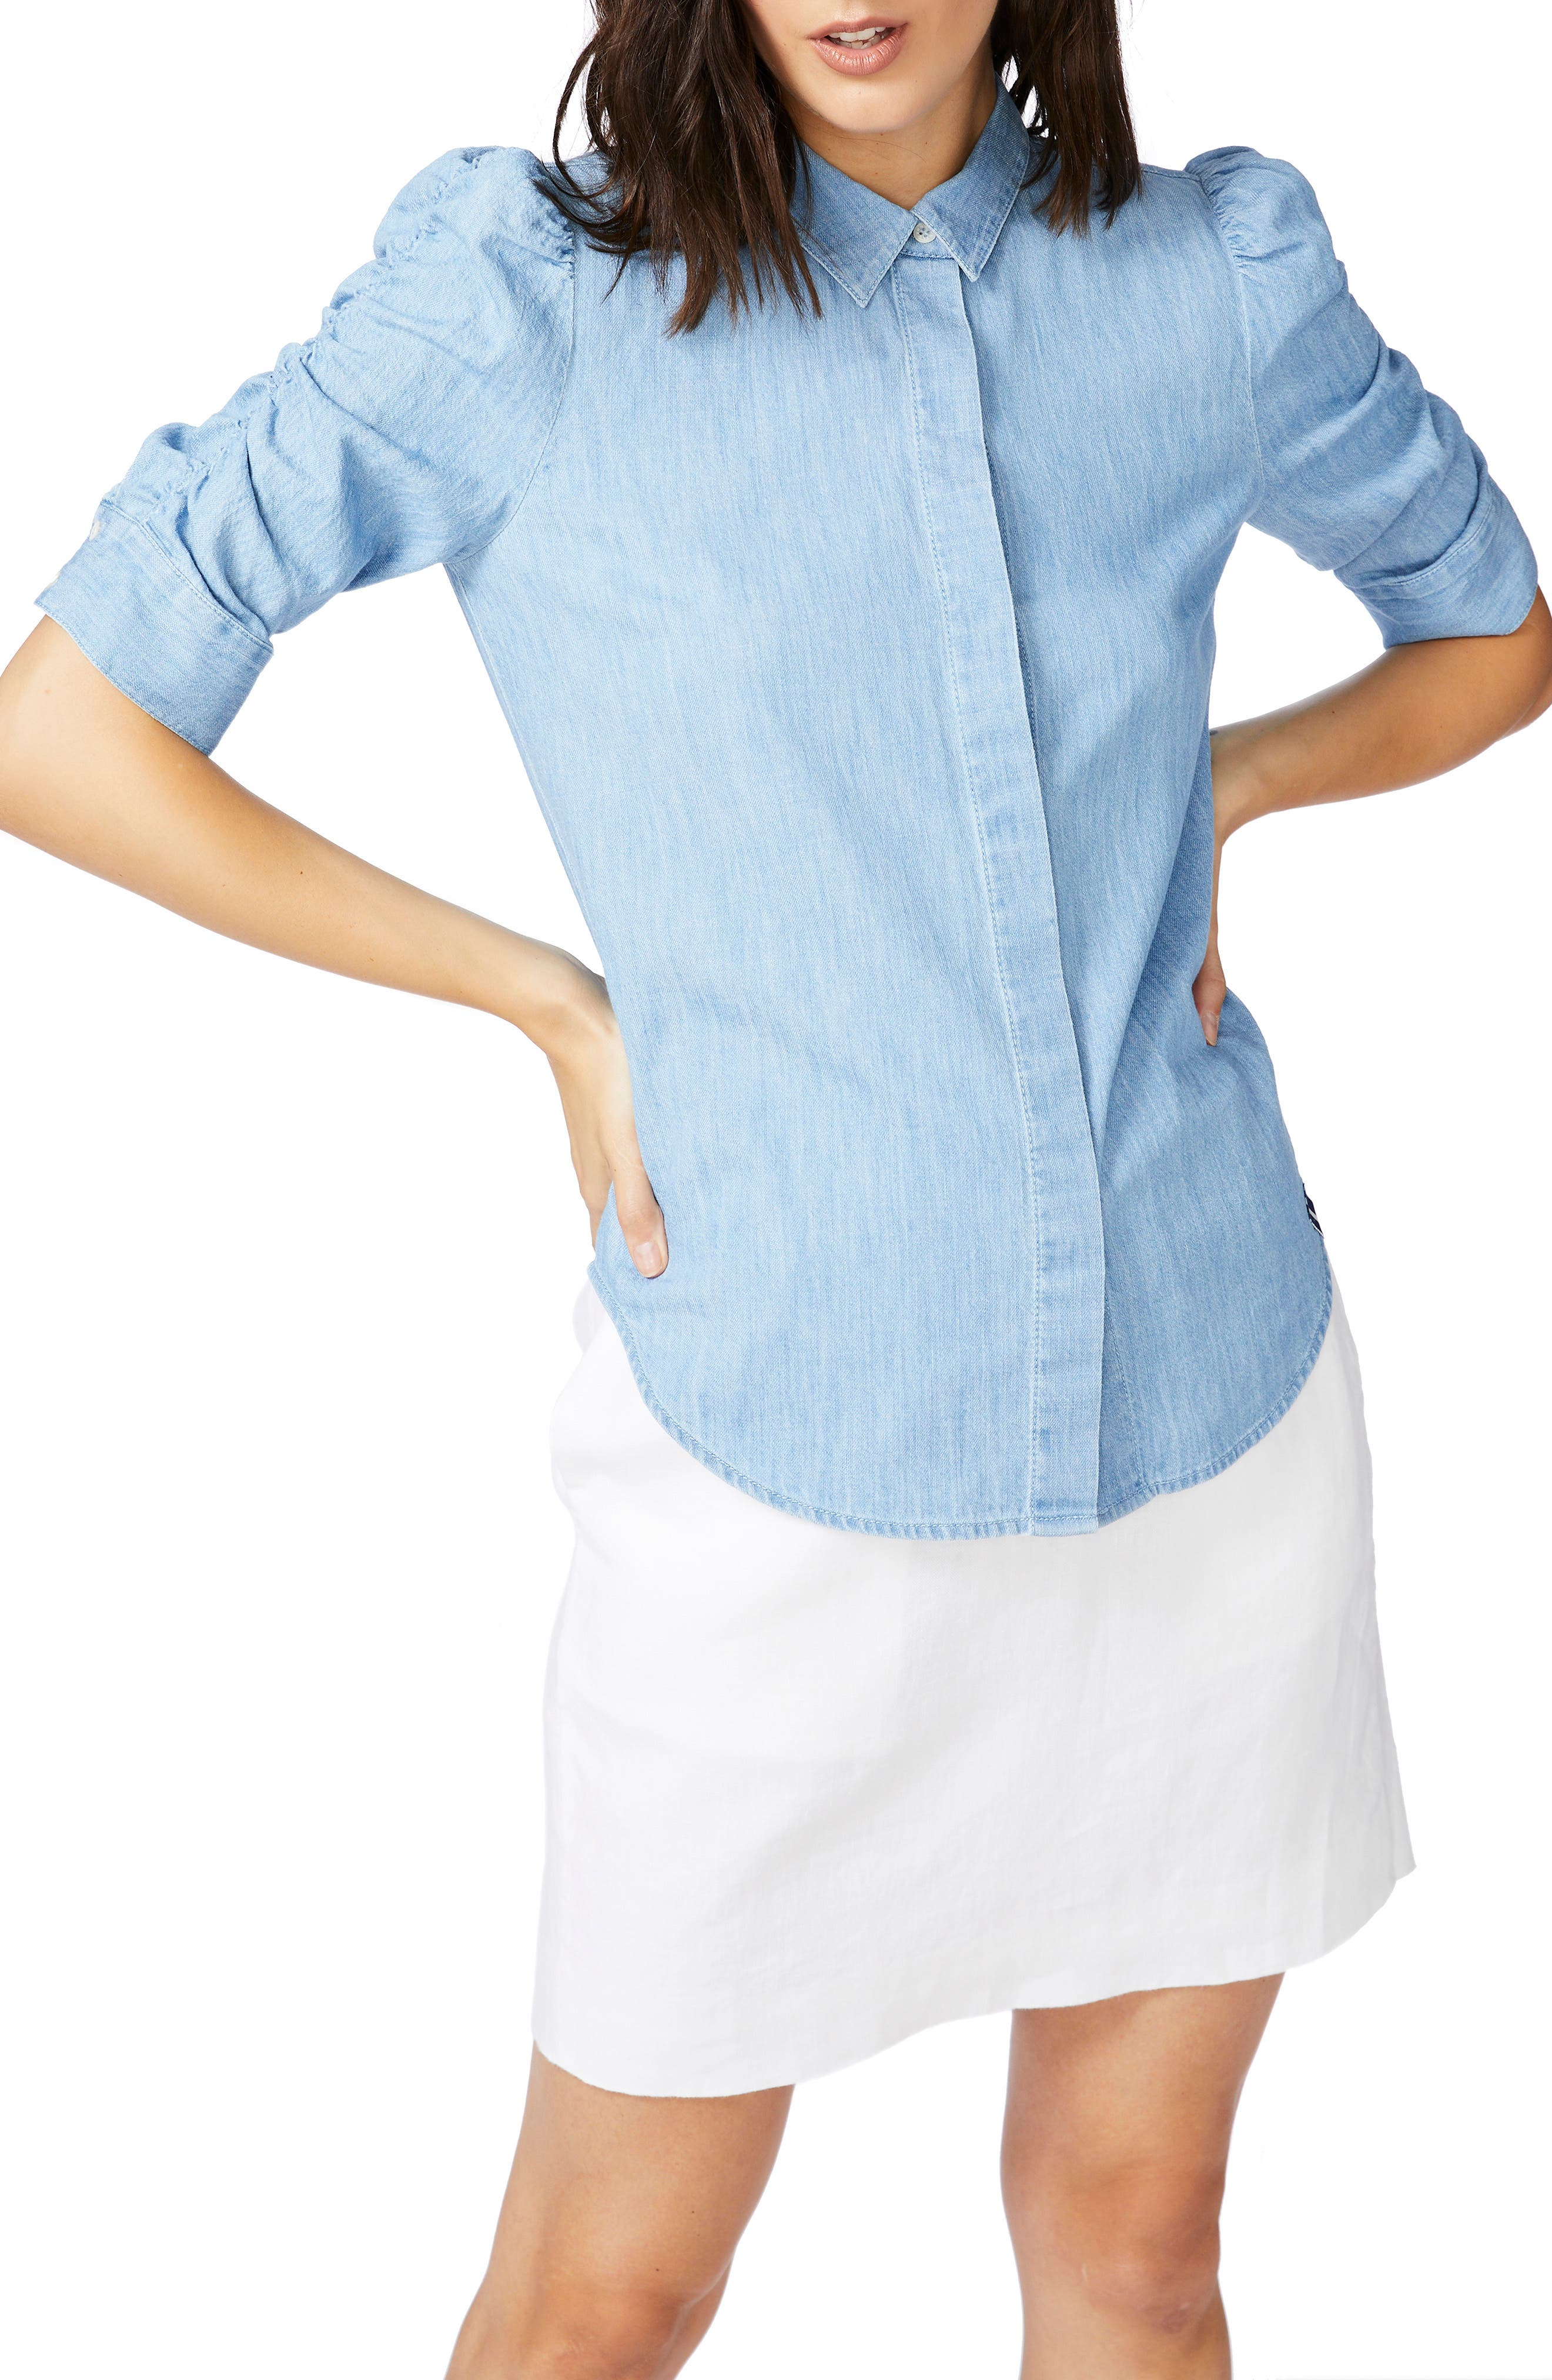 Ruched Sleeve Denim Shirt